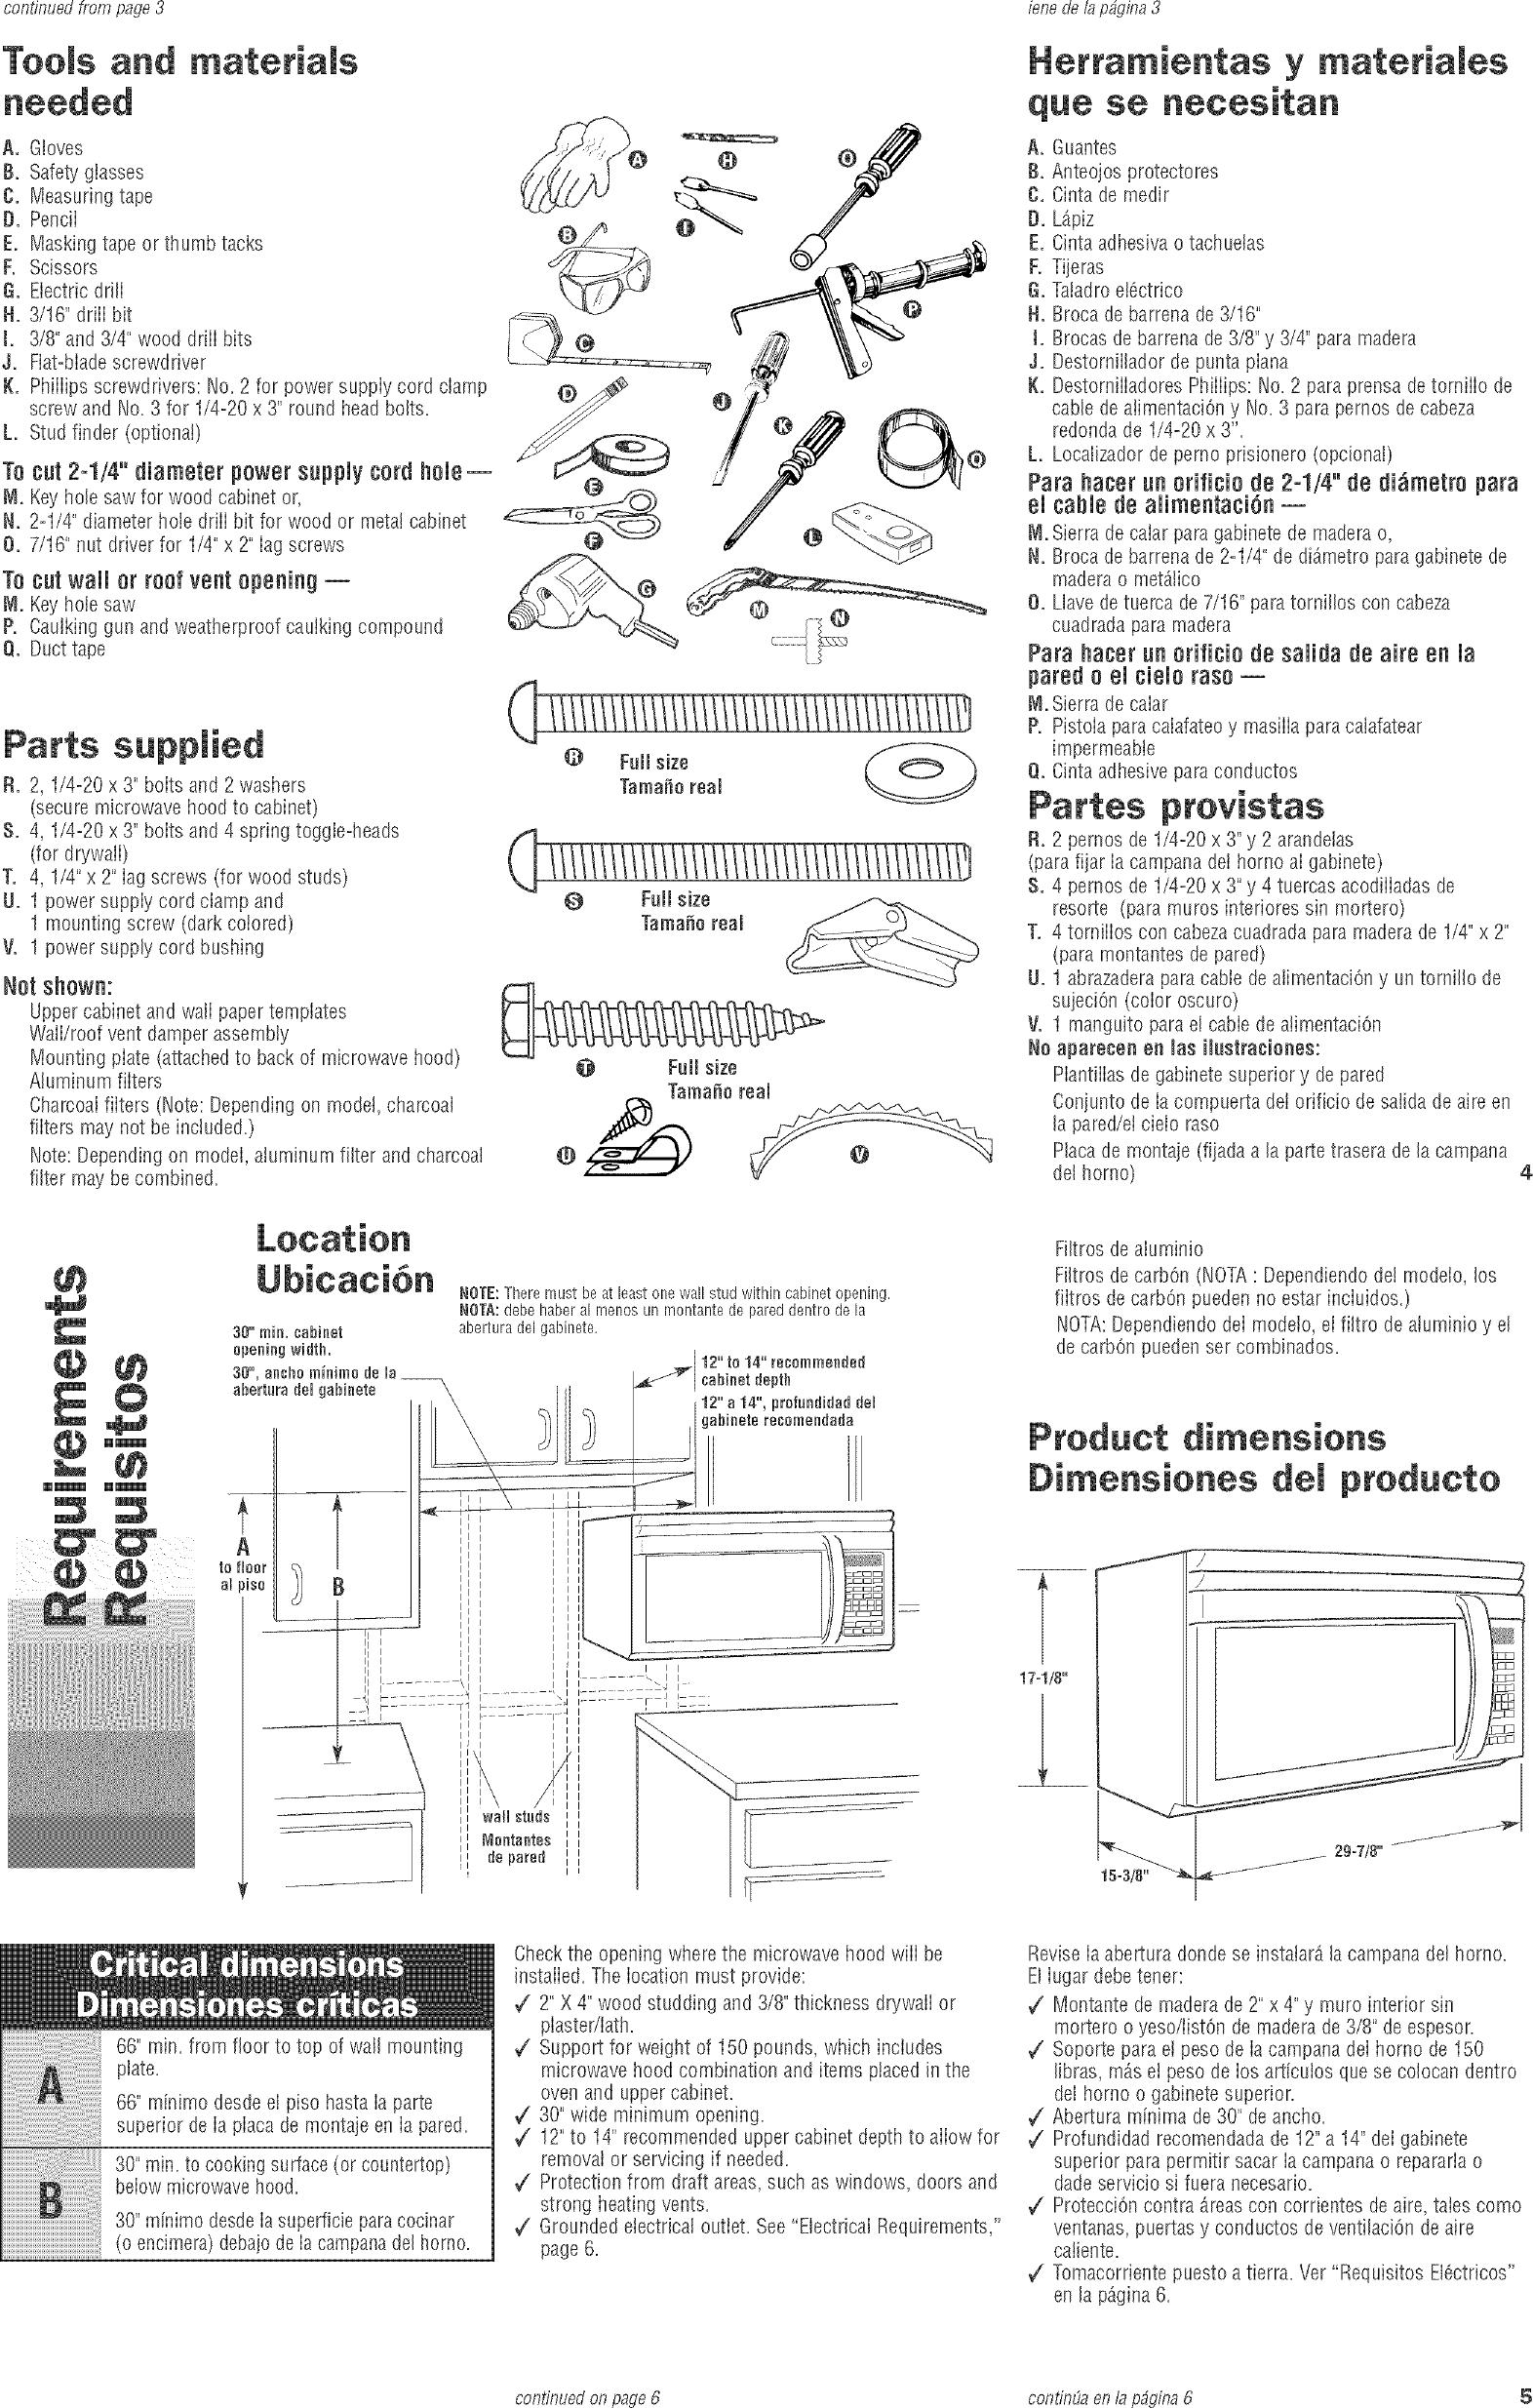 Whirlpool Microwave Manual